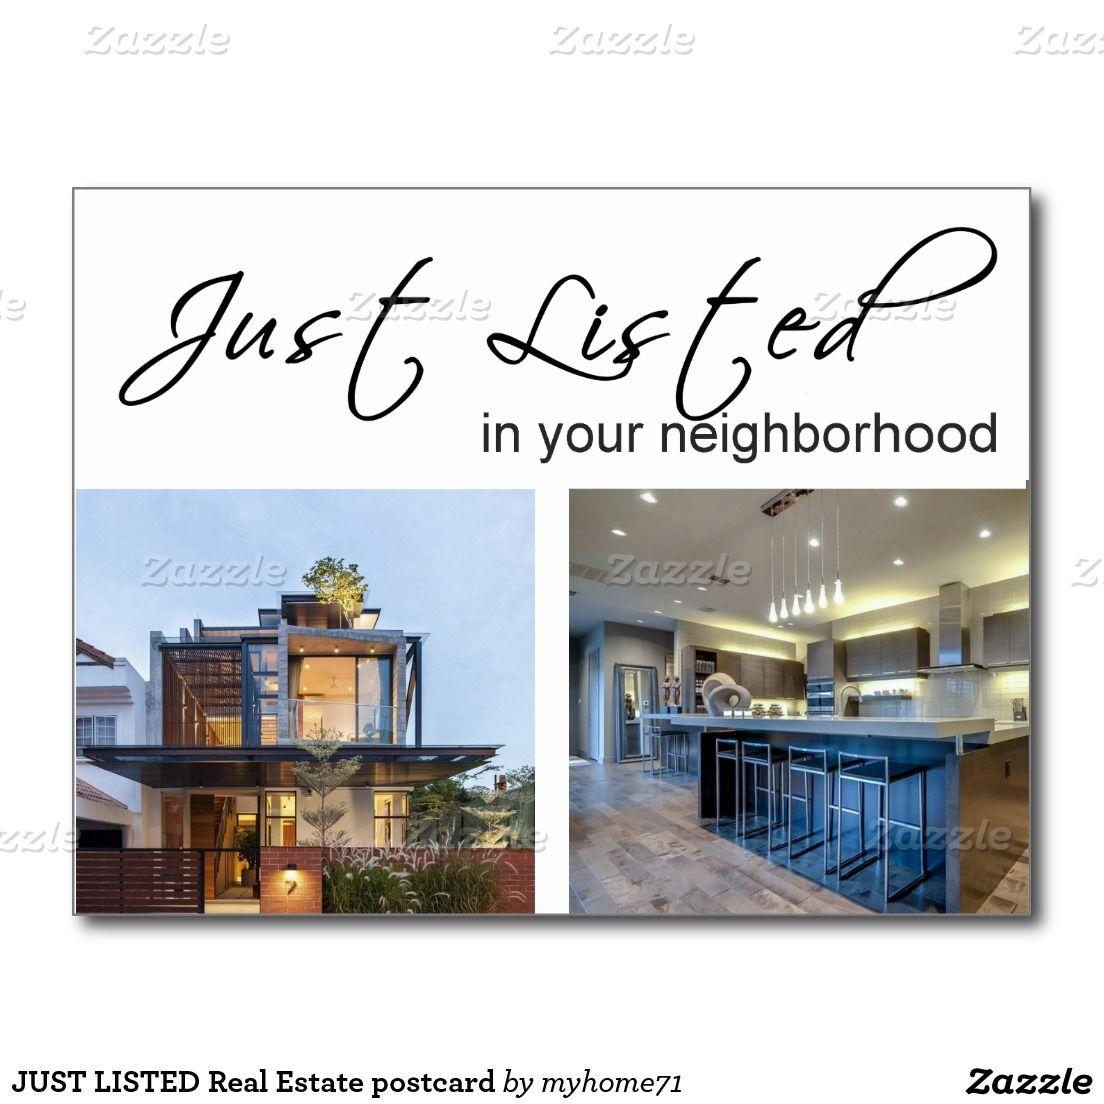 just listed real estate postcard postcards real estate just listed real estate postcard